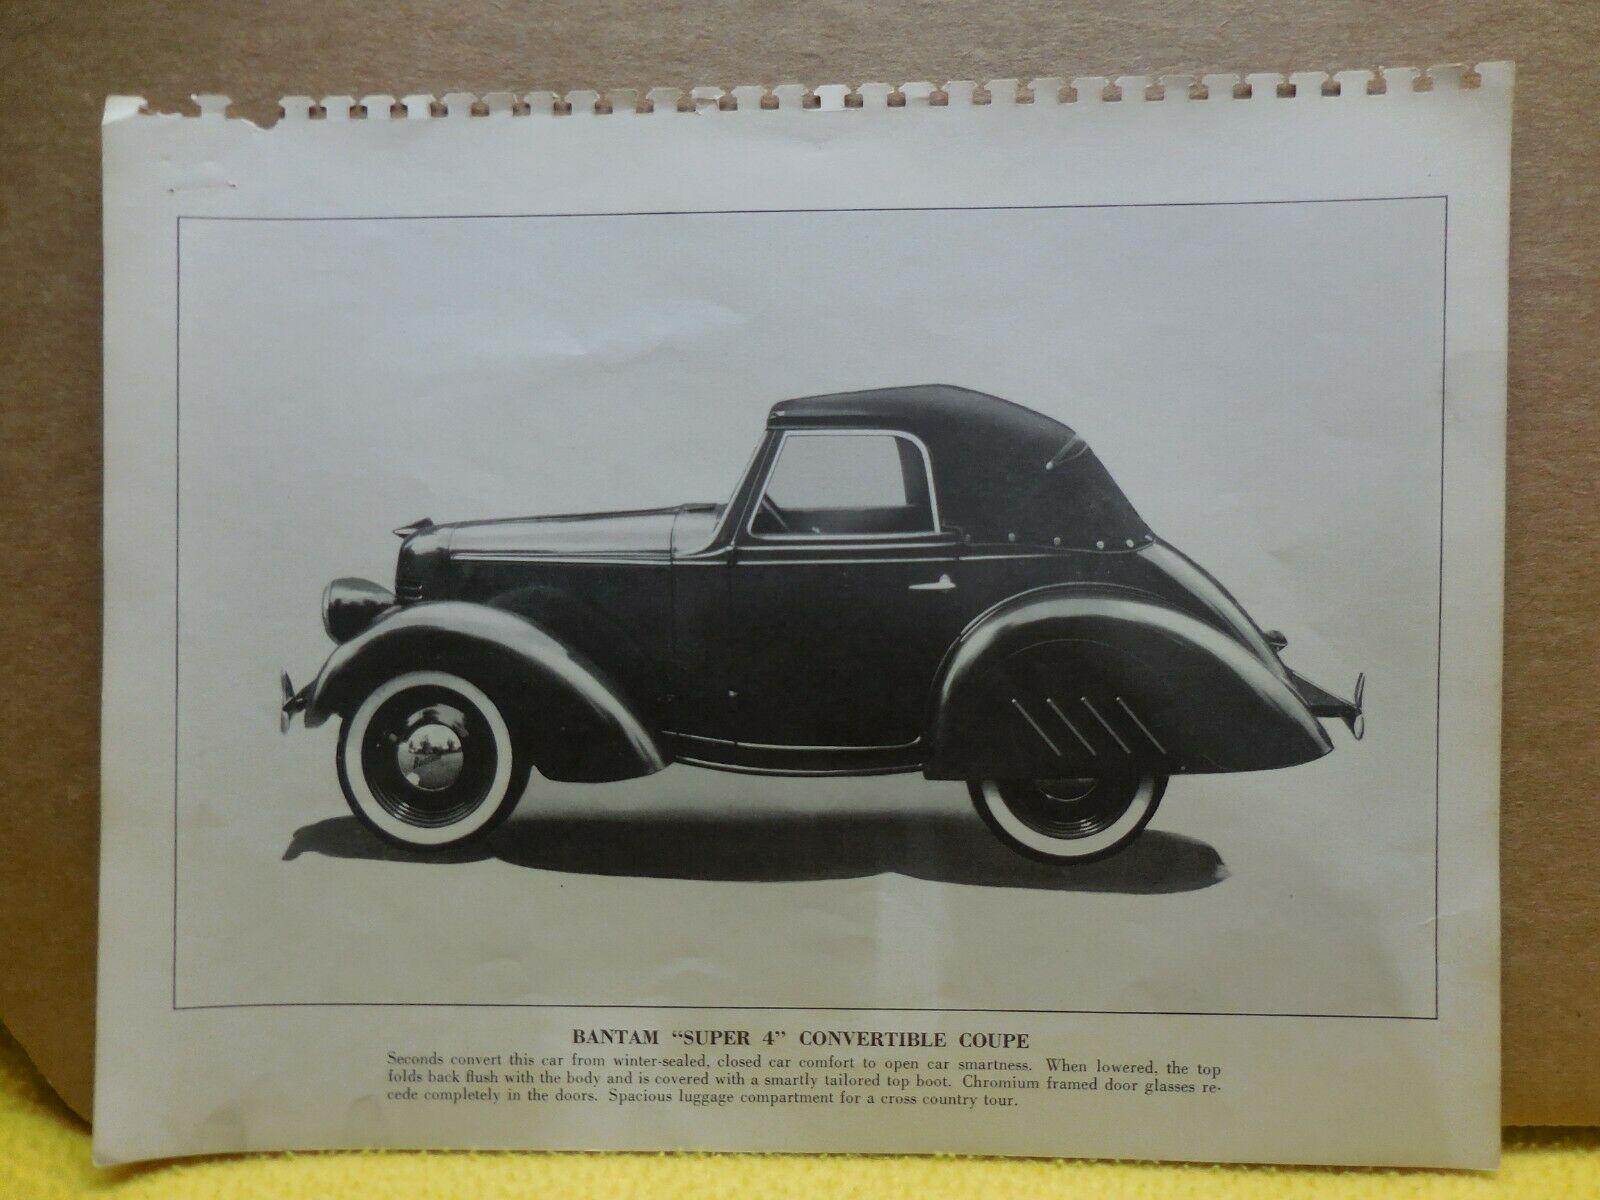 1940 Bantam Convertible Coupe Factory Photo